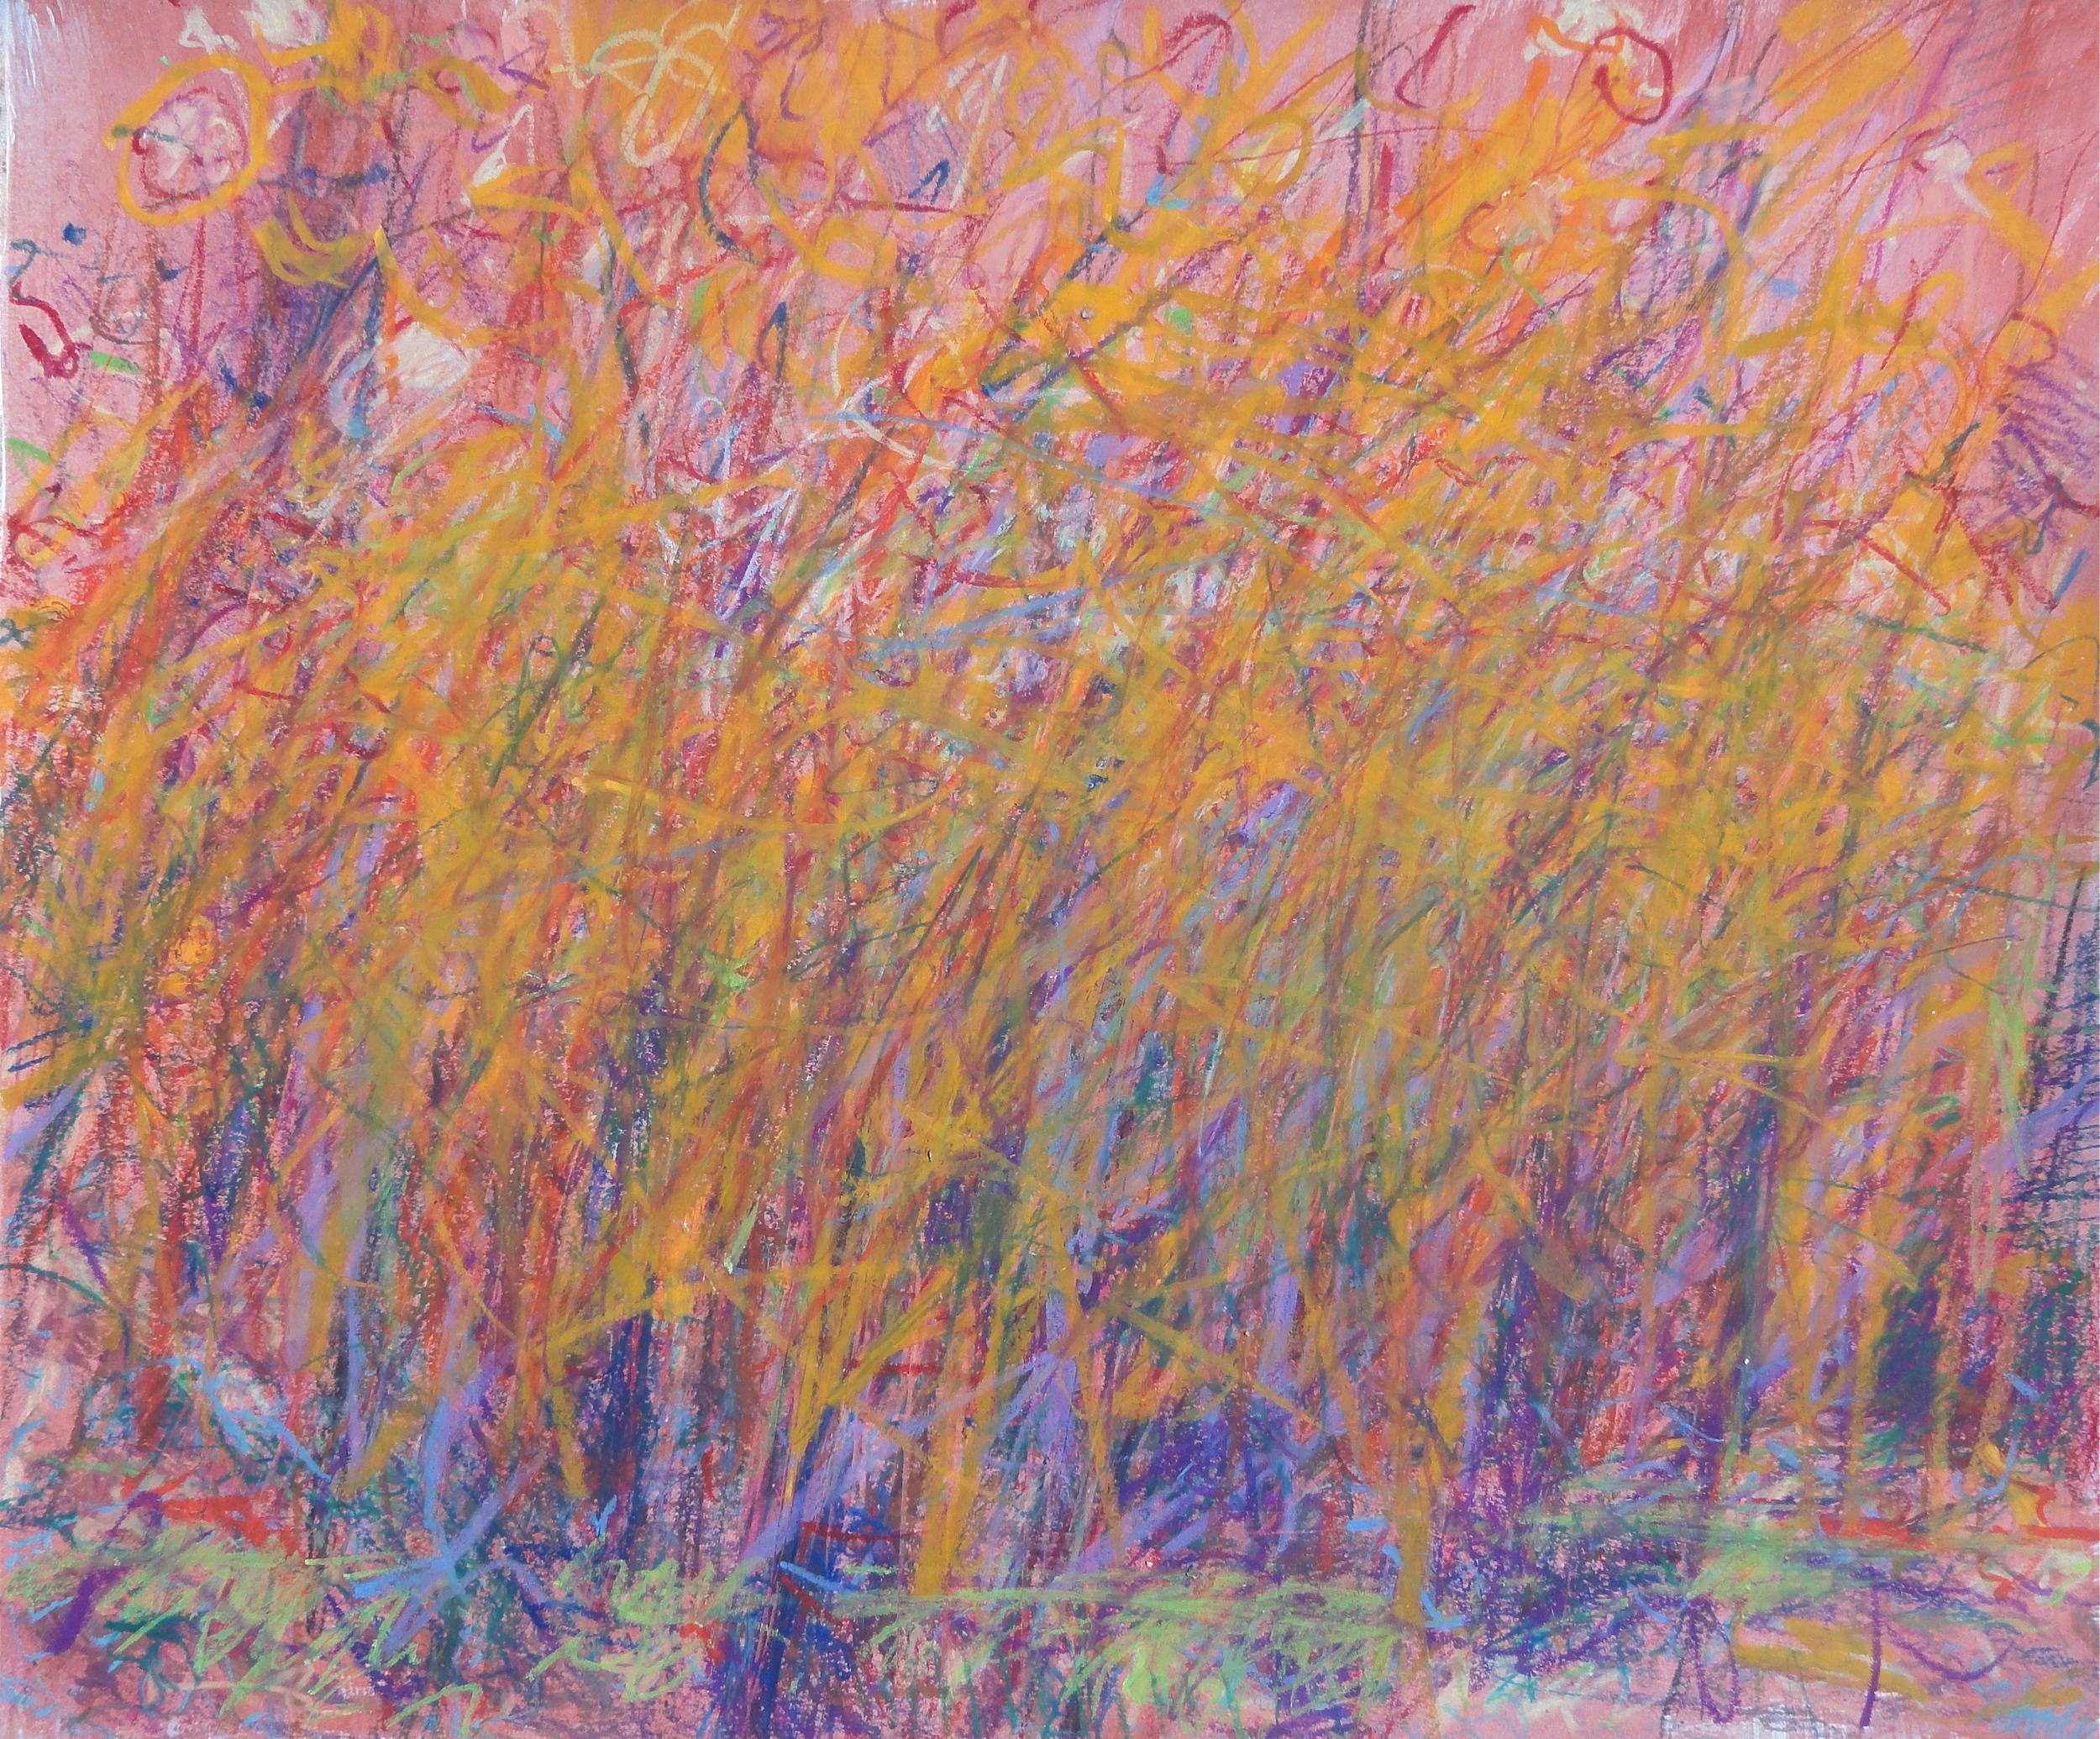 14x17' gouache/oil pastel 2009